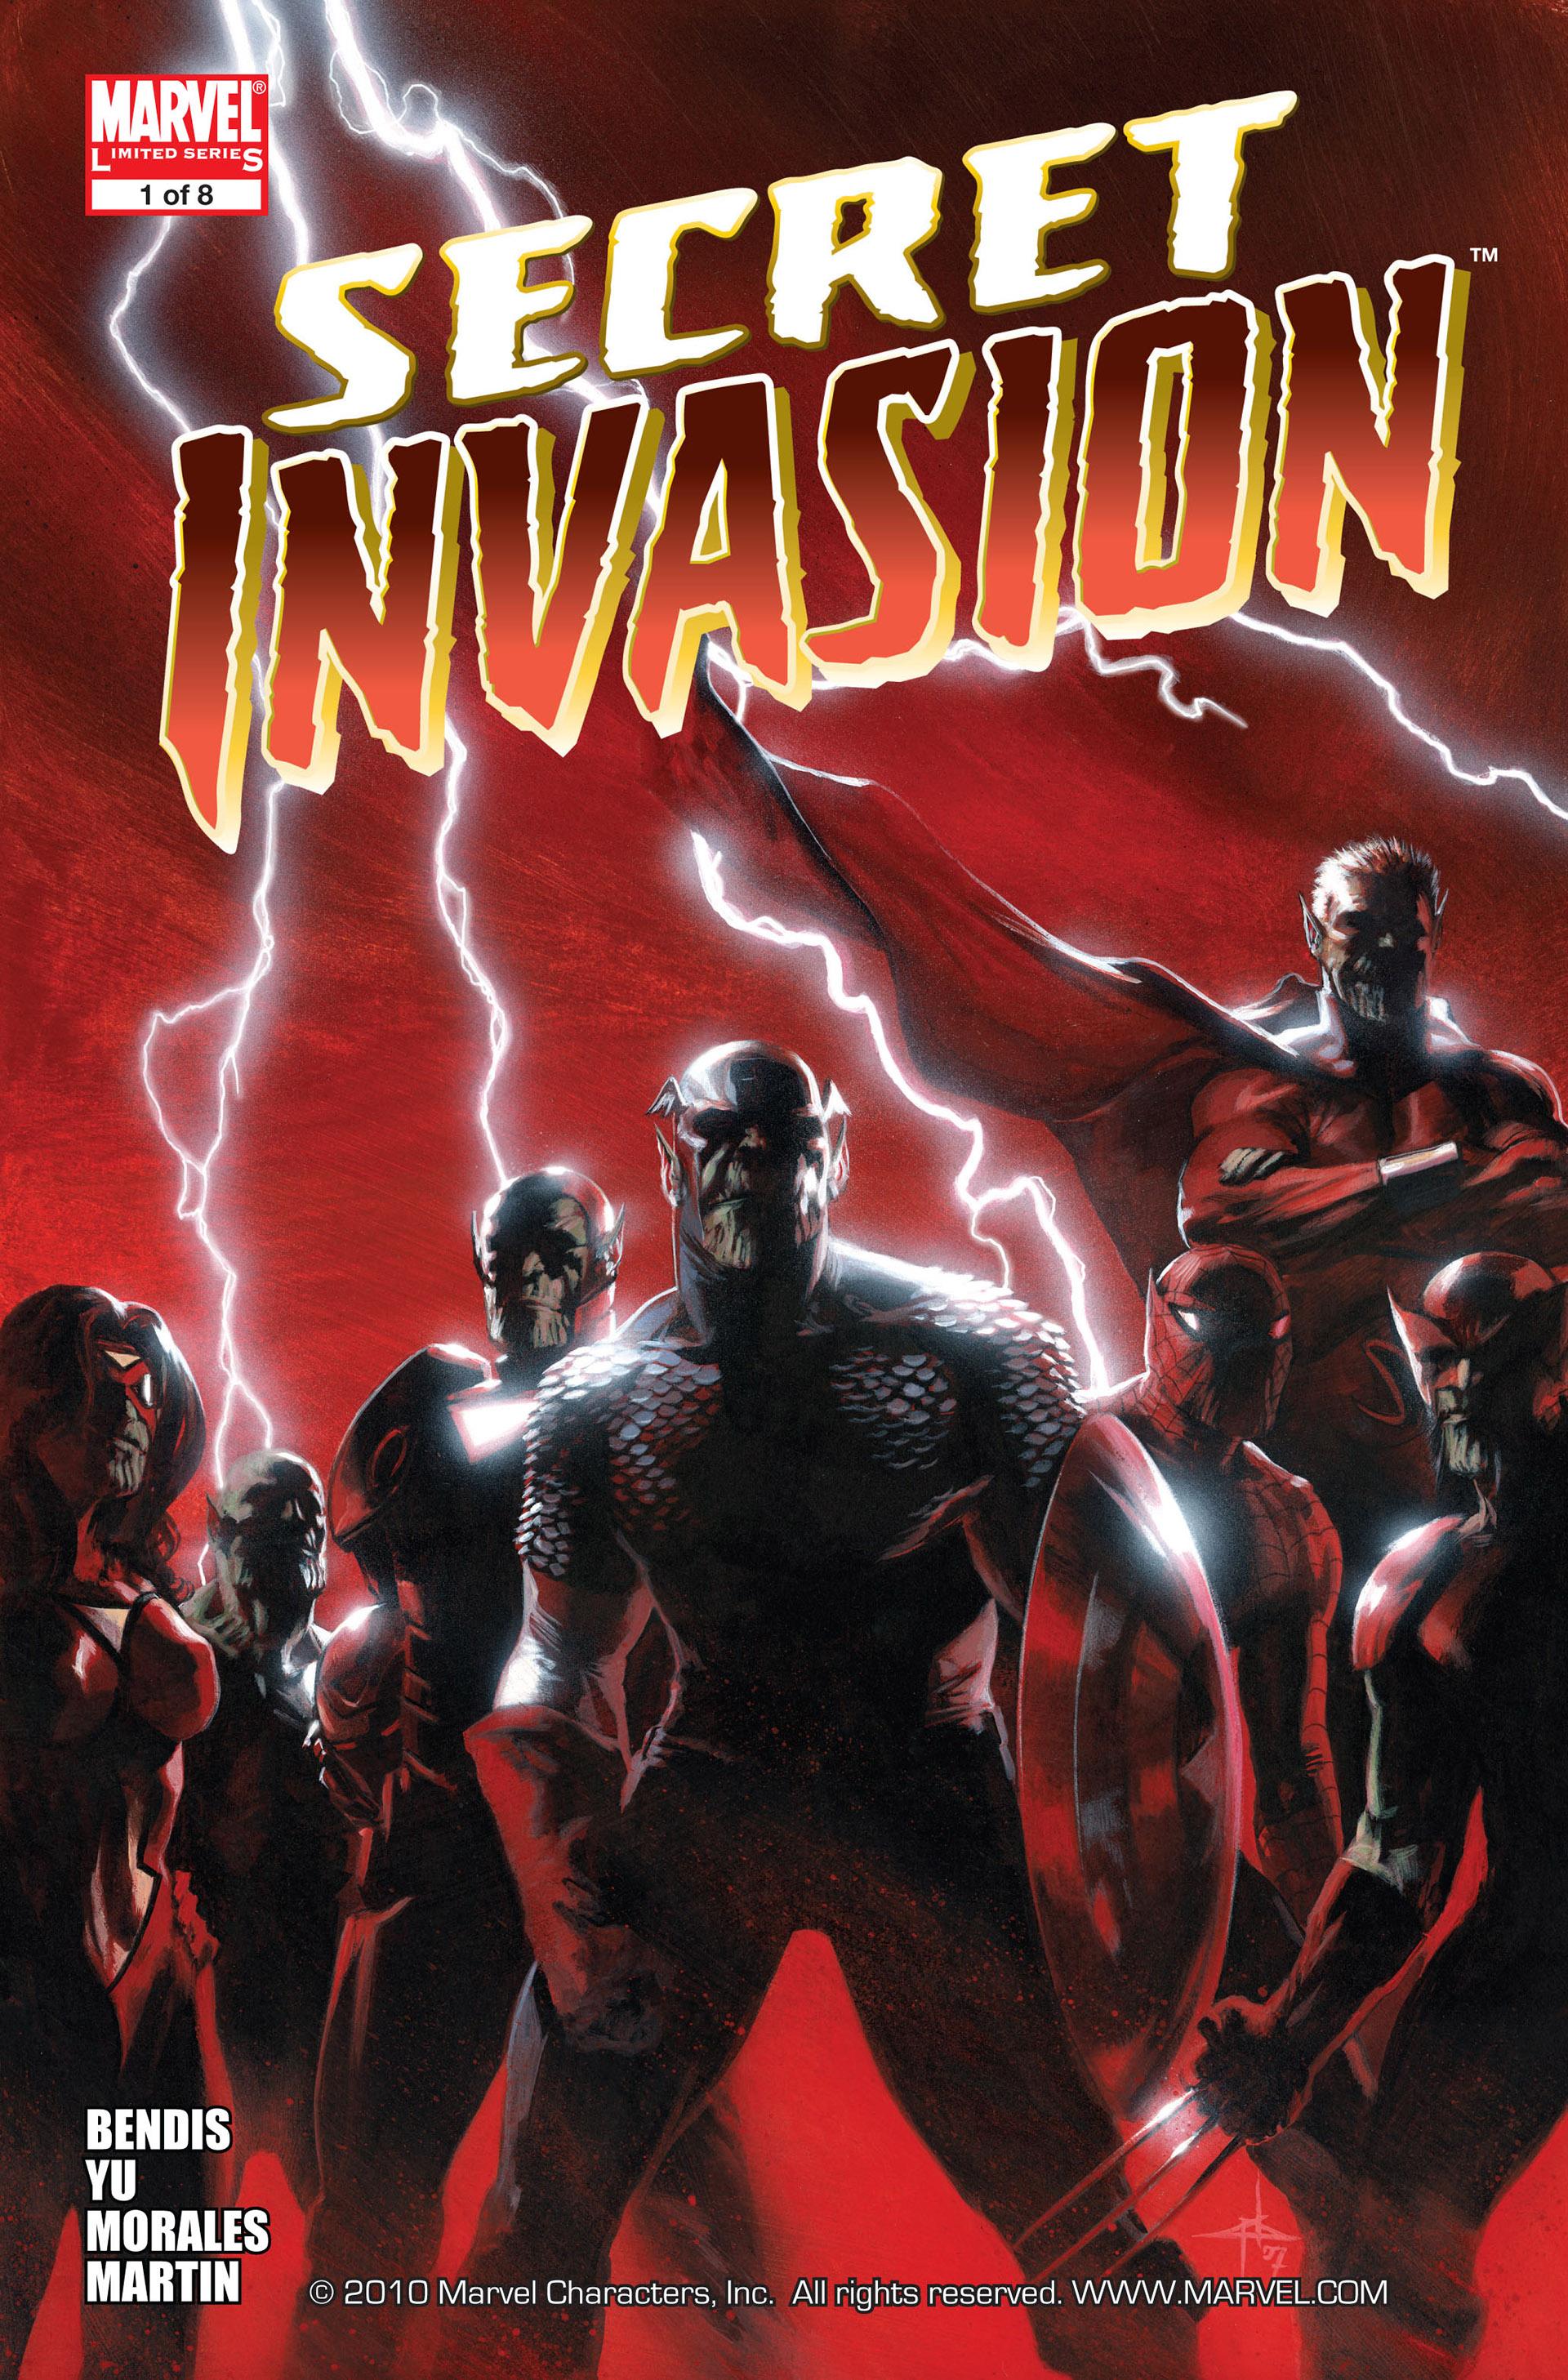 Read online Secret Invasion comic -  Issue #1 - 1